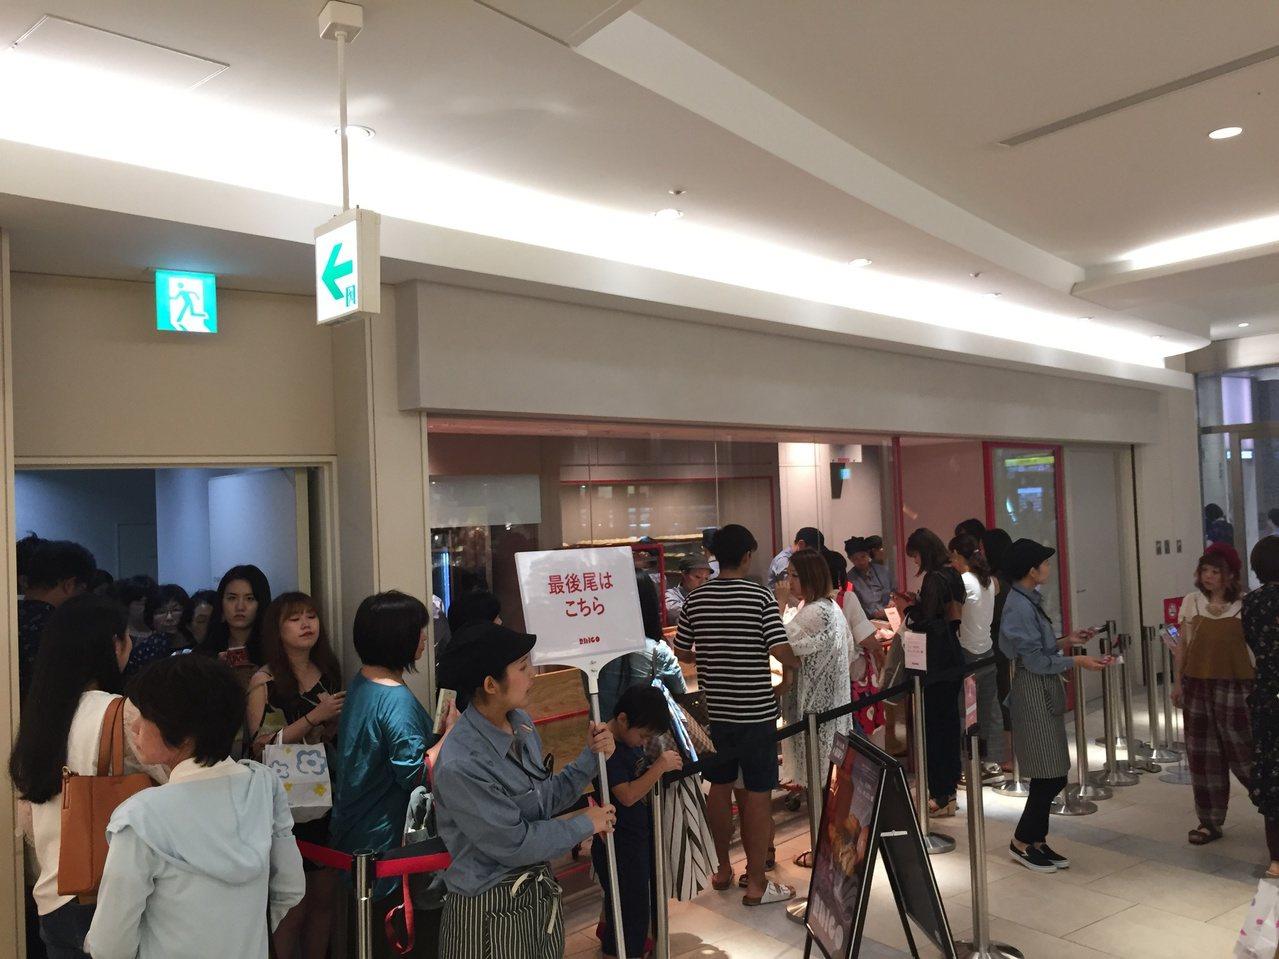 RAPL澎派令果目前於池袋、川崎、福岡、大阪開出4家分店,將在台北開設首家海外分...